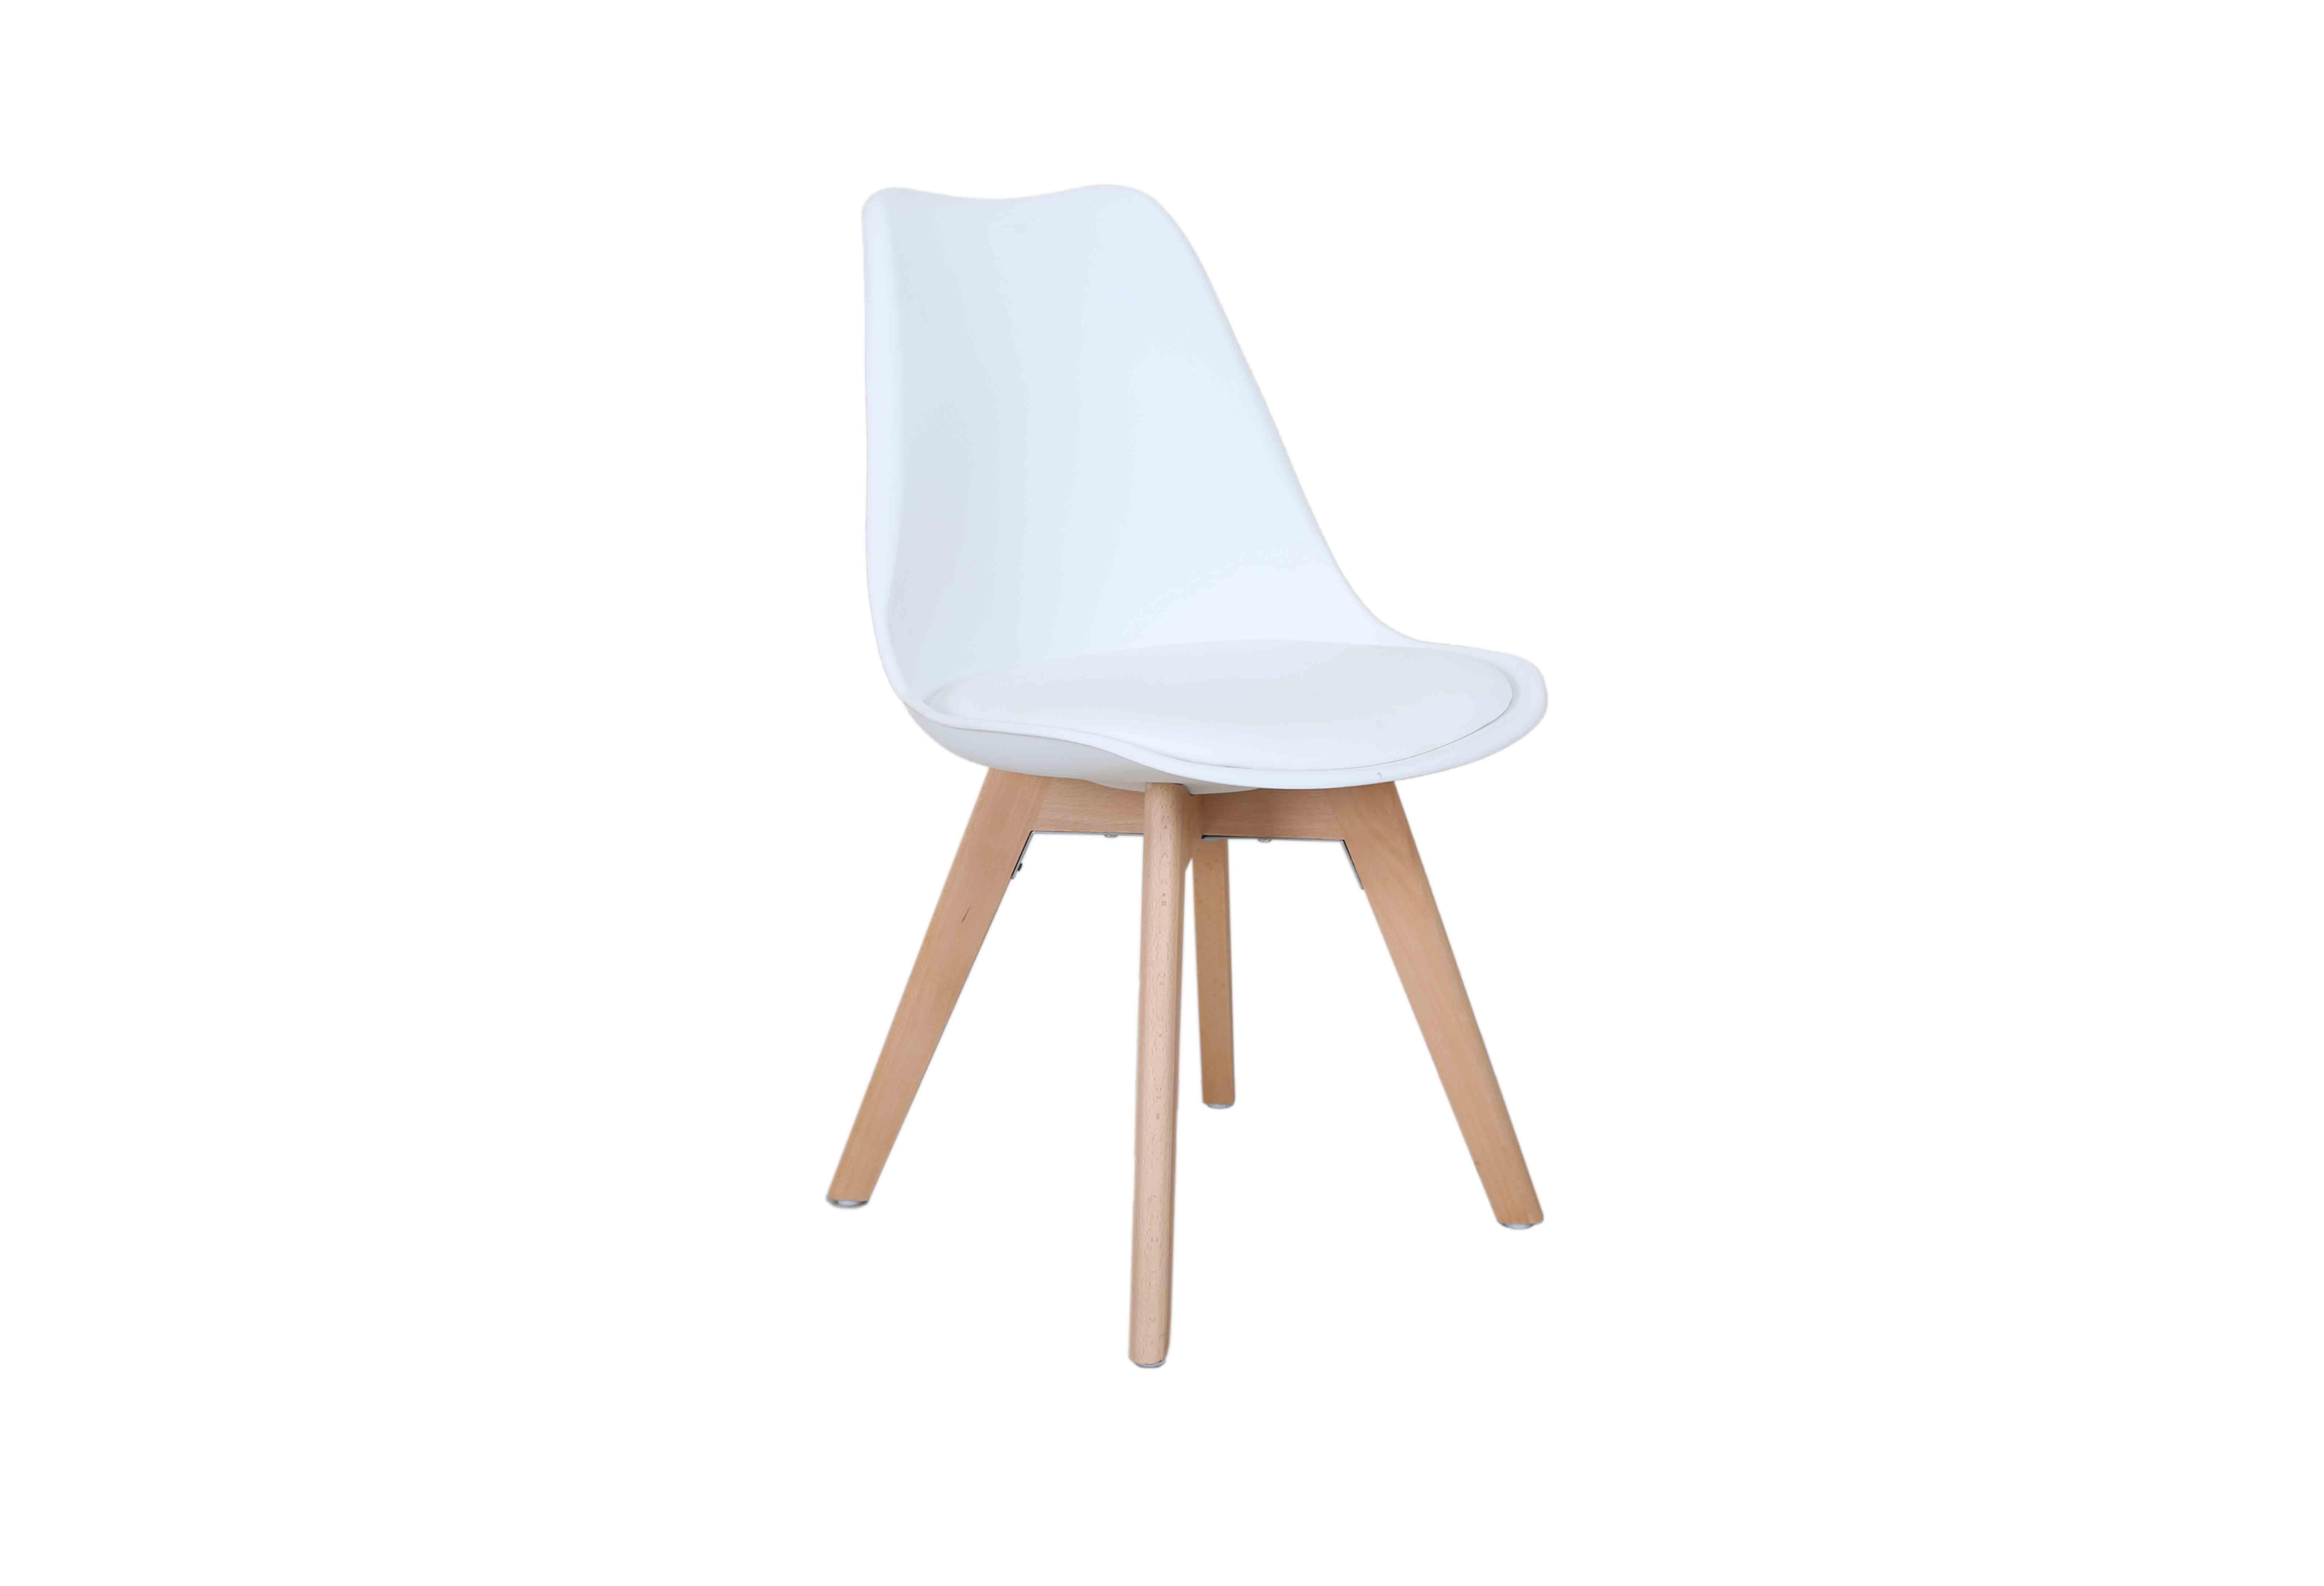 Design stoel wit design eettafel stoelen designstoel leaf wit